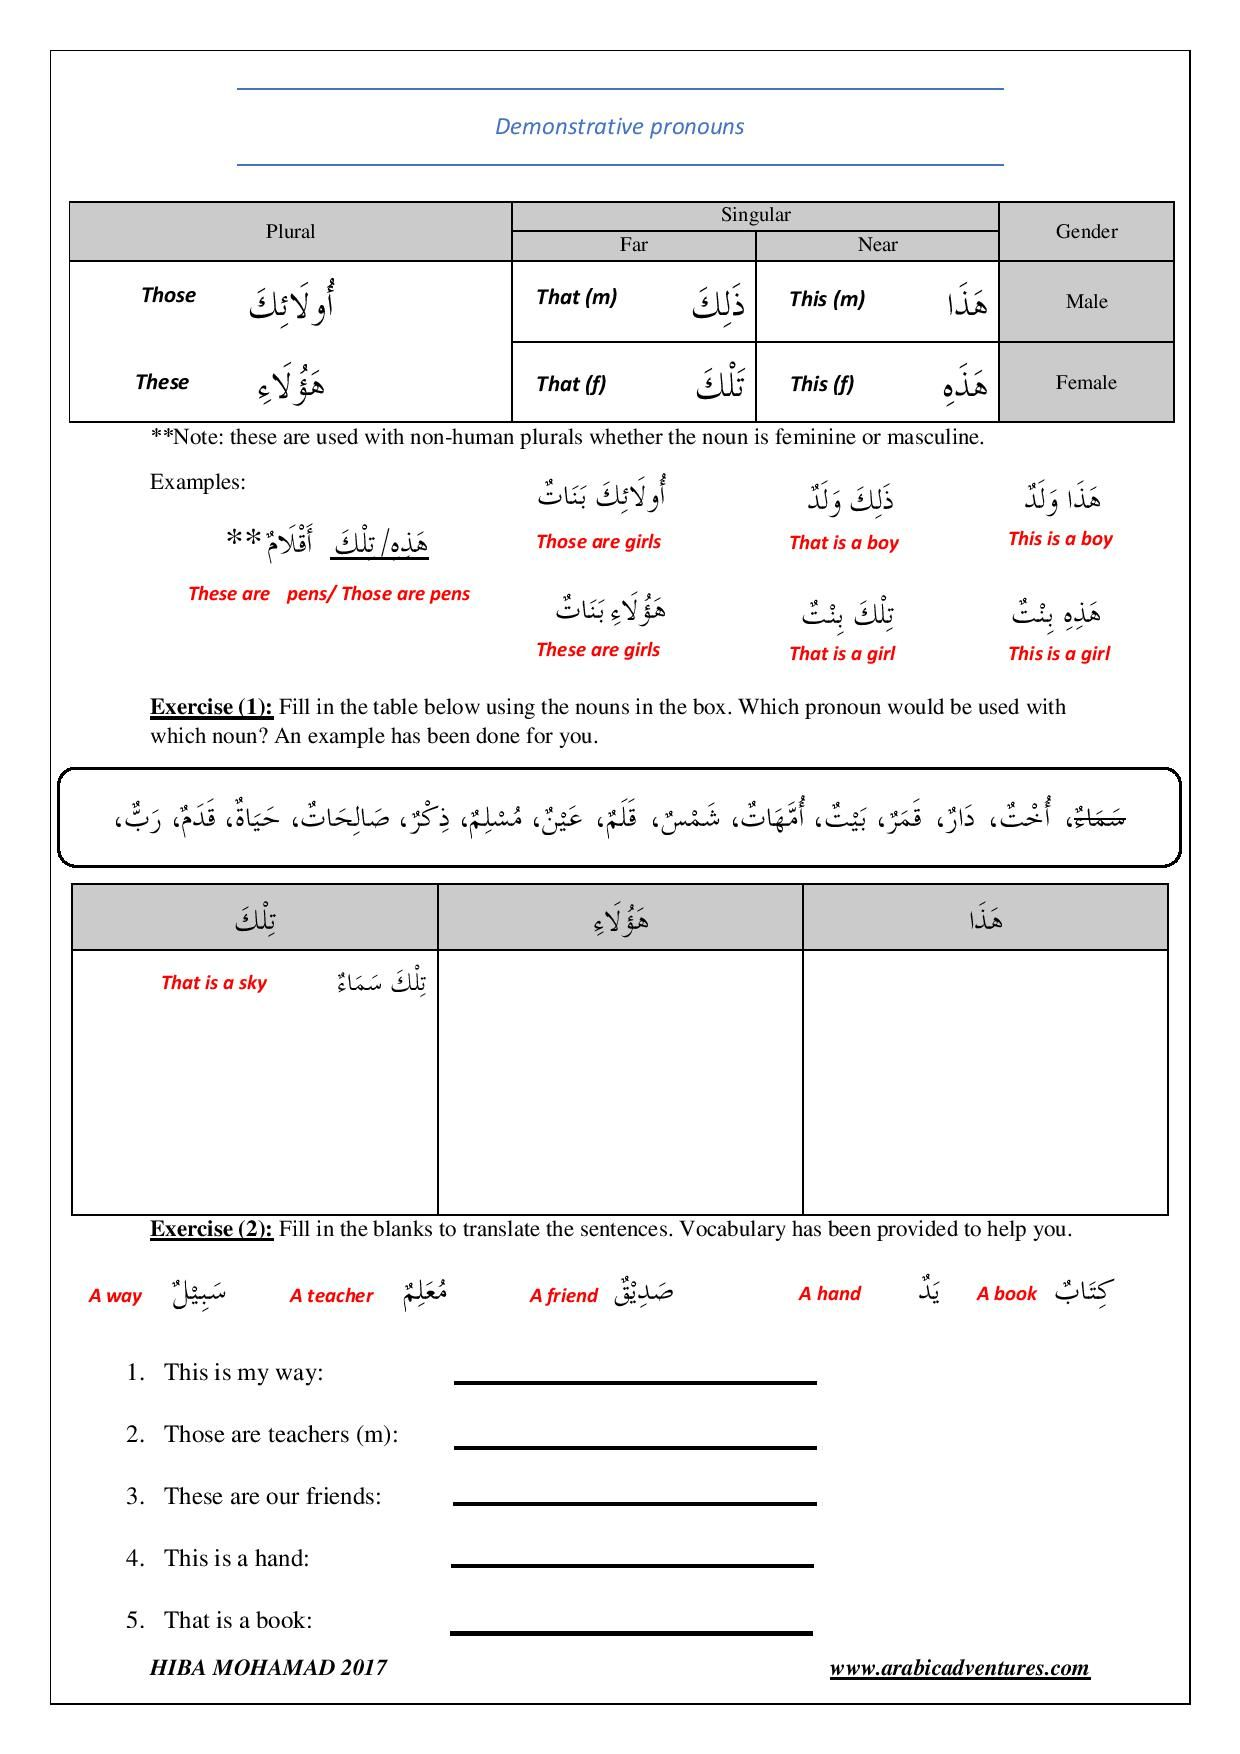 medium resolution of Demonstrative pronouns worksheet www.arabicadventures.com   Demonstrative  pronouns